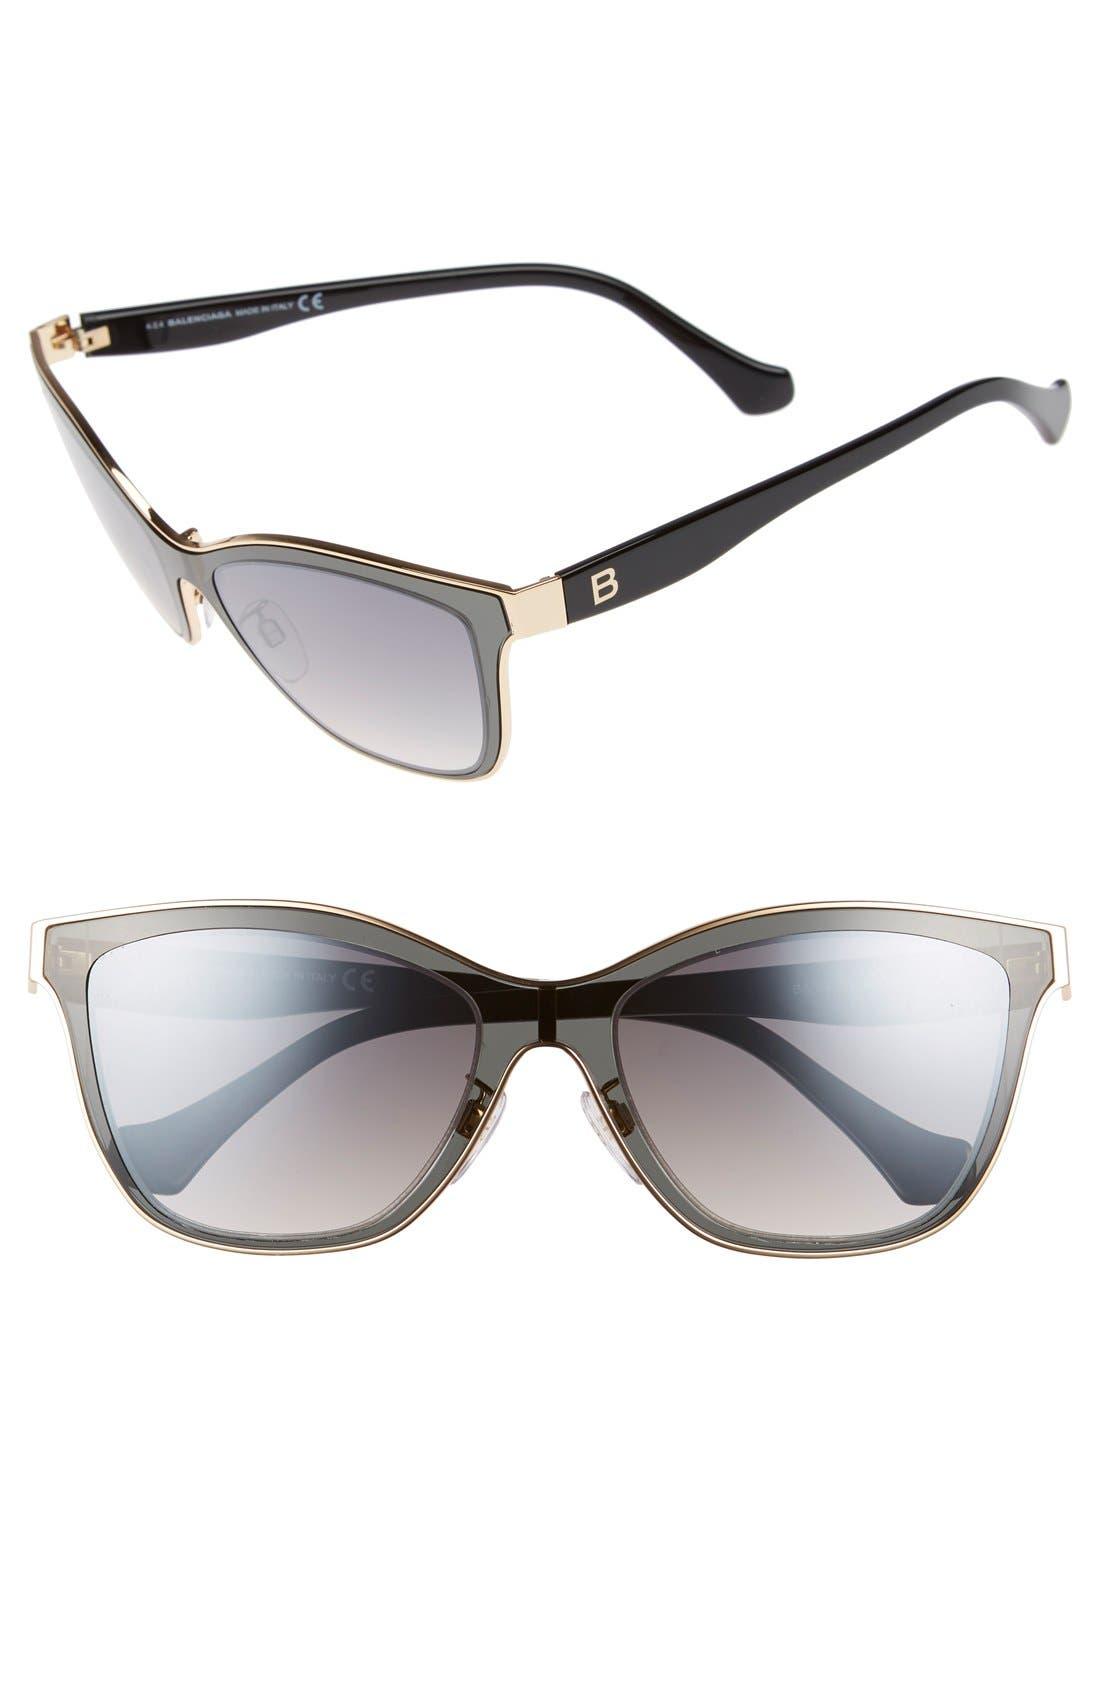 Paris 54mm Sunglasses,                             Main thumbnail 1, color,                             Rose Gold/ Black/ Smoke